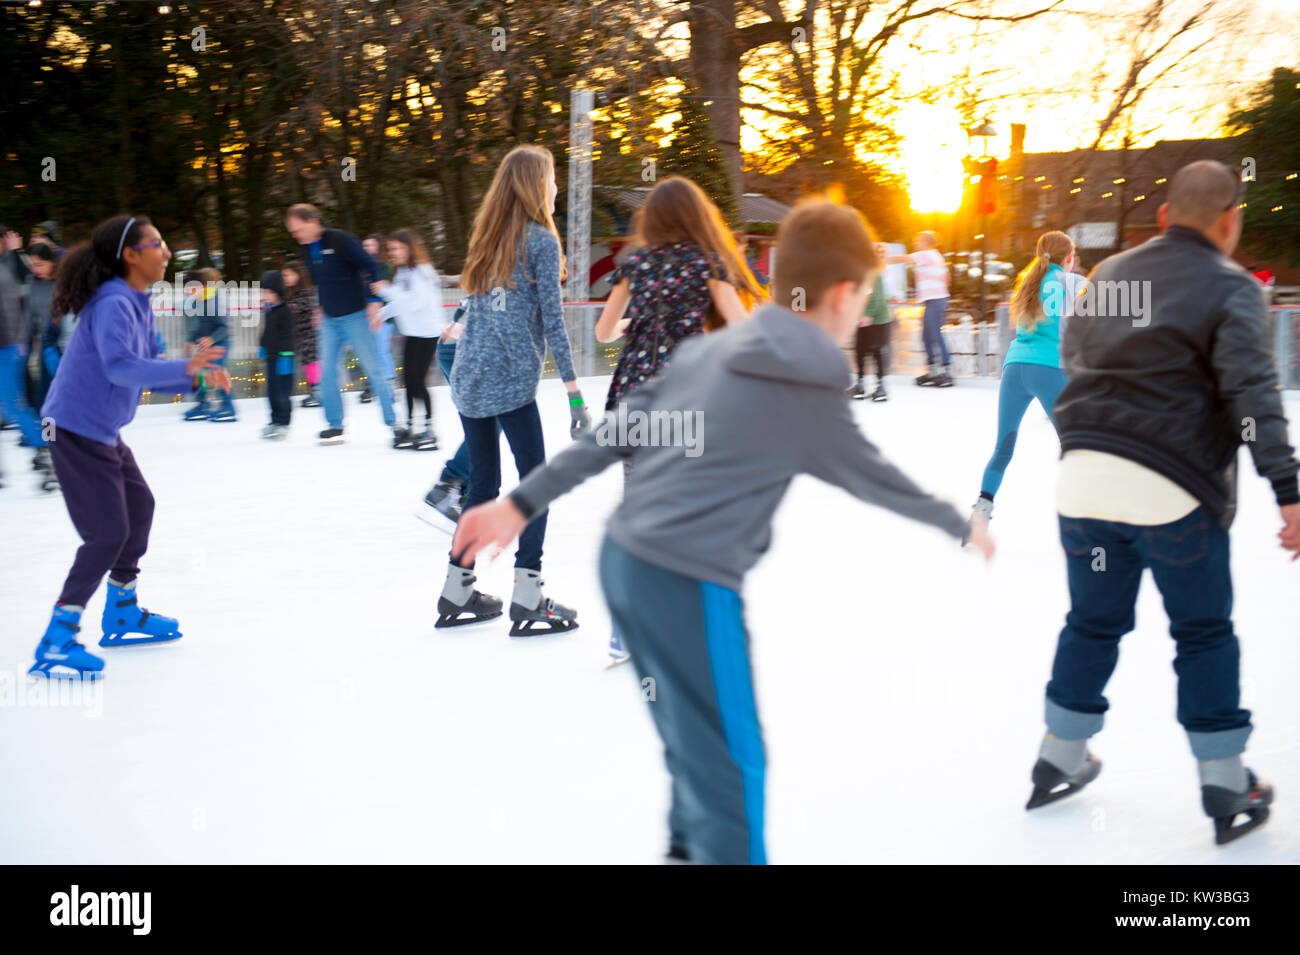 USA Virginia VA Colonial Williamsburg Christmas Winter Holidays Ice Skating on the Duke of Gloucester Street on - Stock Image